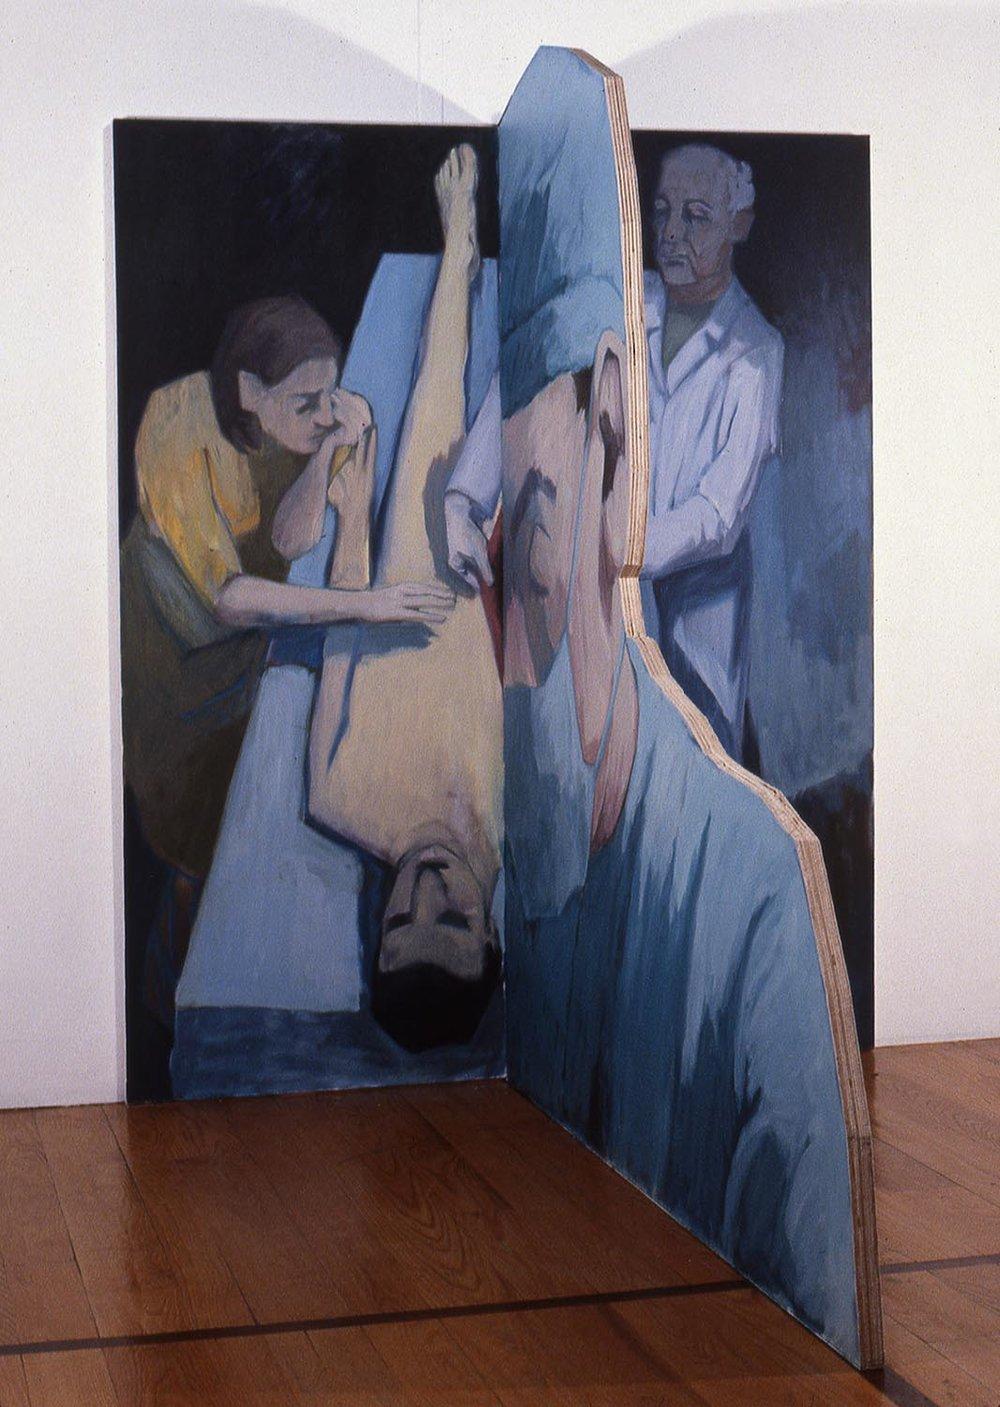 Autopsie (Autopsy), 1985